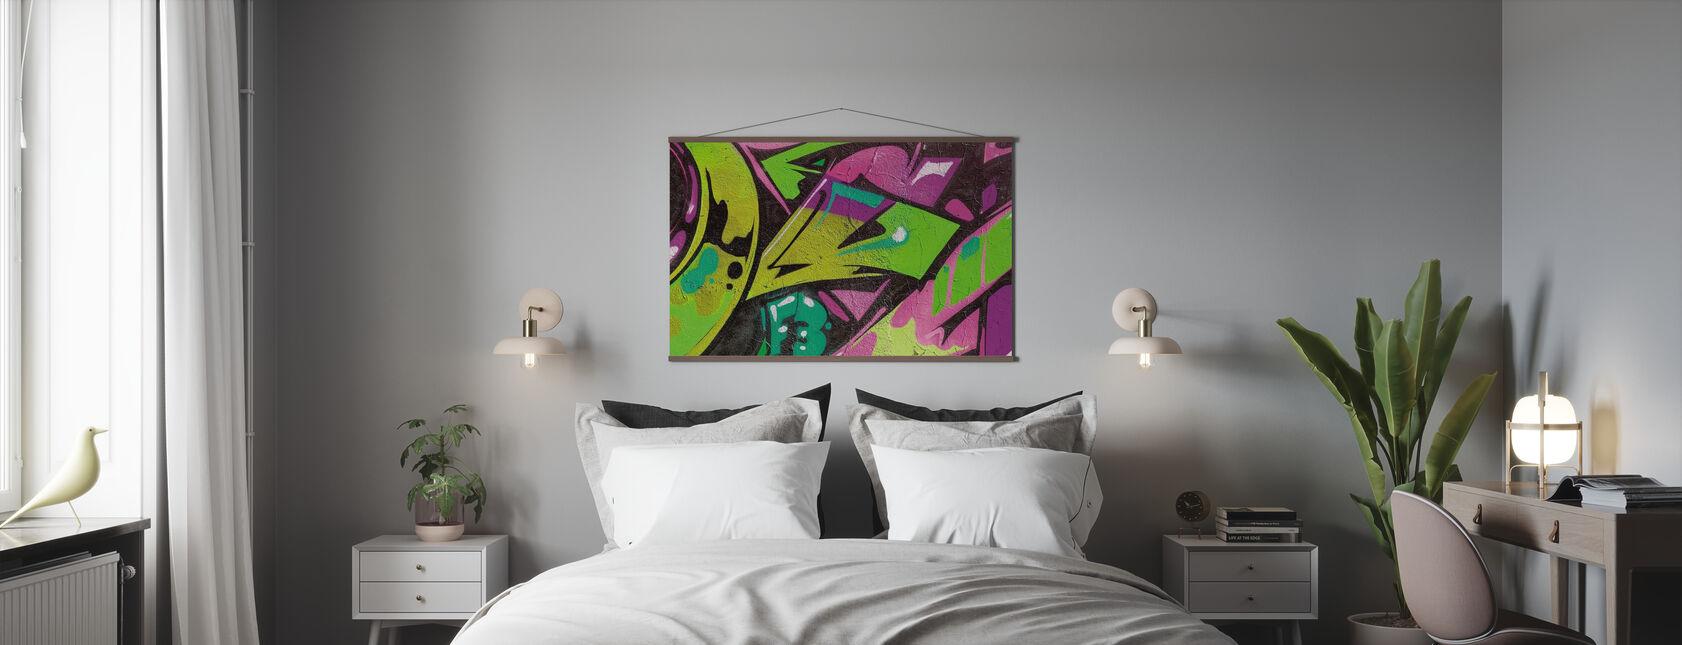 Urban Graffiti Detalj - Poster - Sovrum